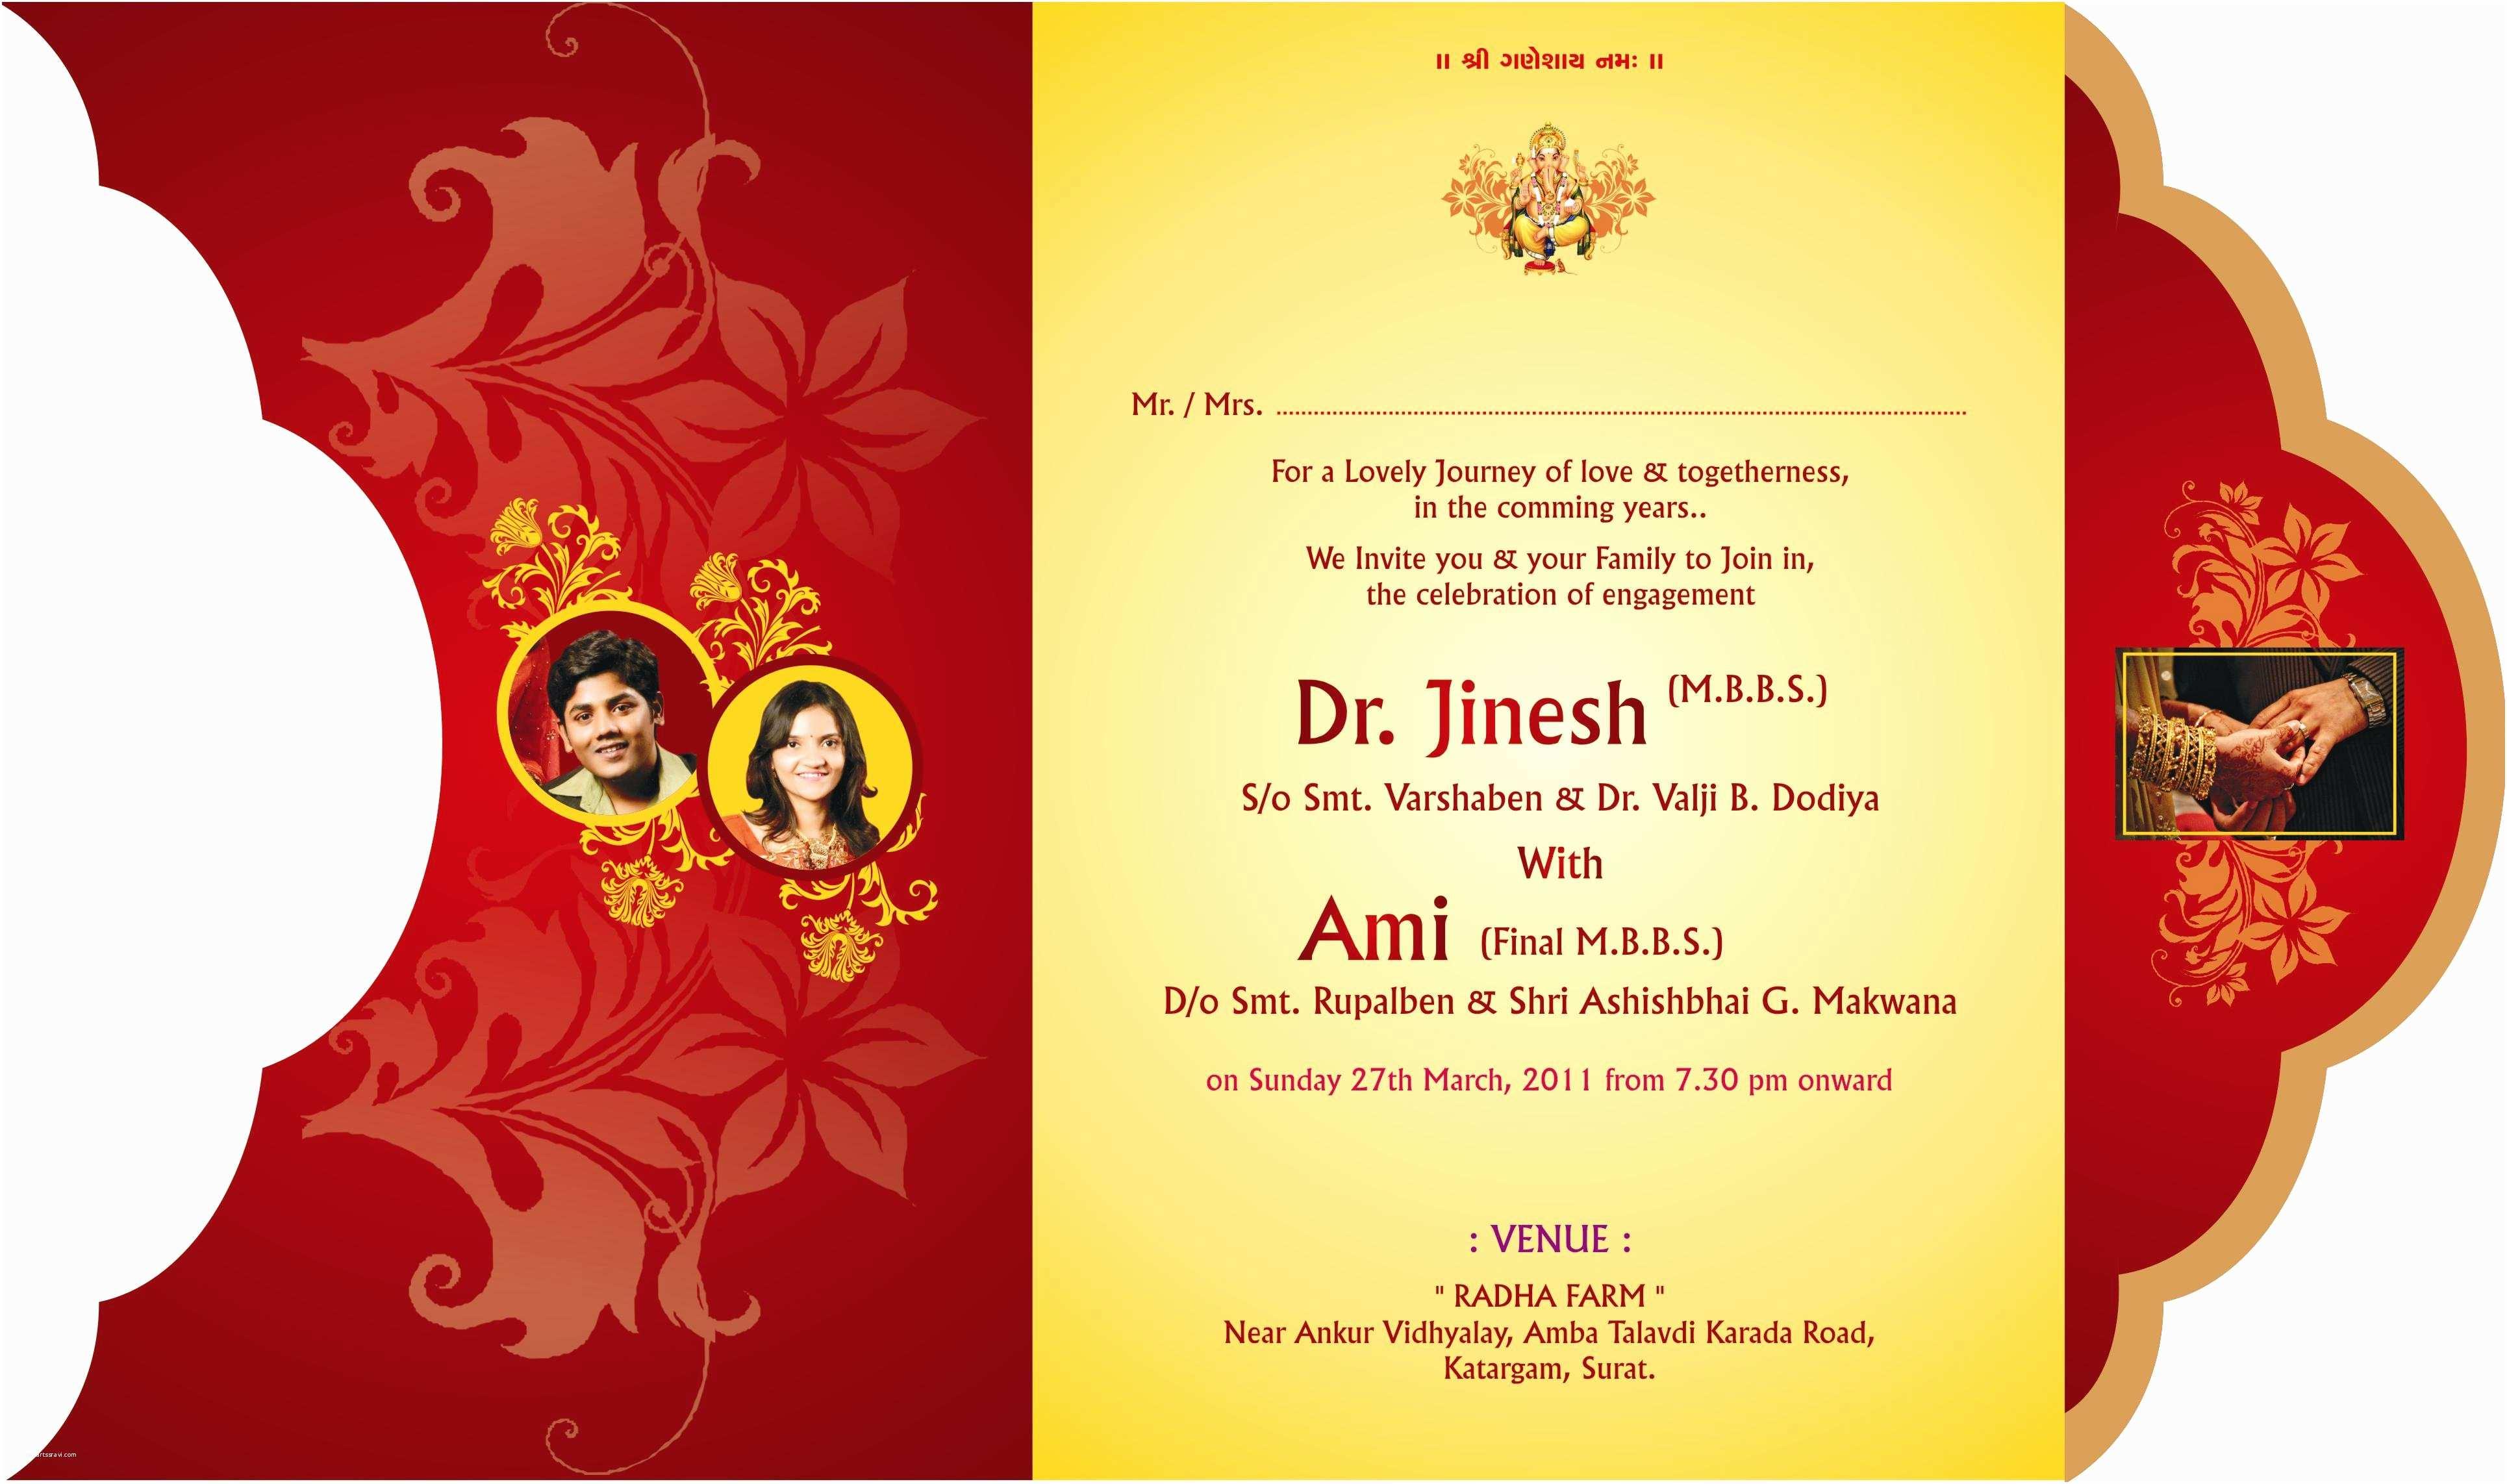 Wedding Invitation Card Design Luxurious Gold Wedding Card Designs Colored oriental